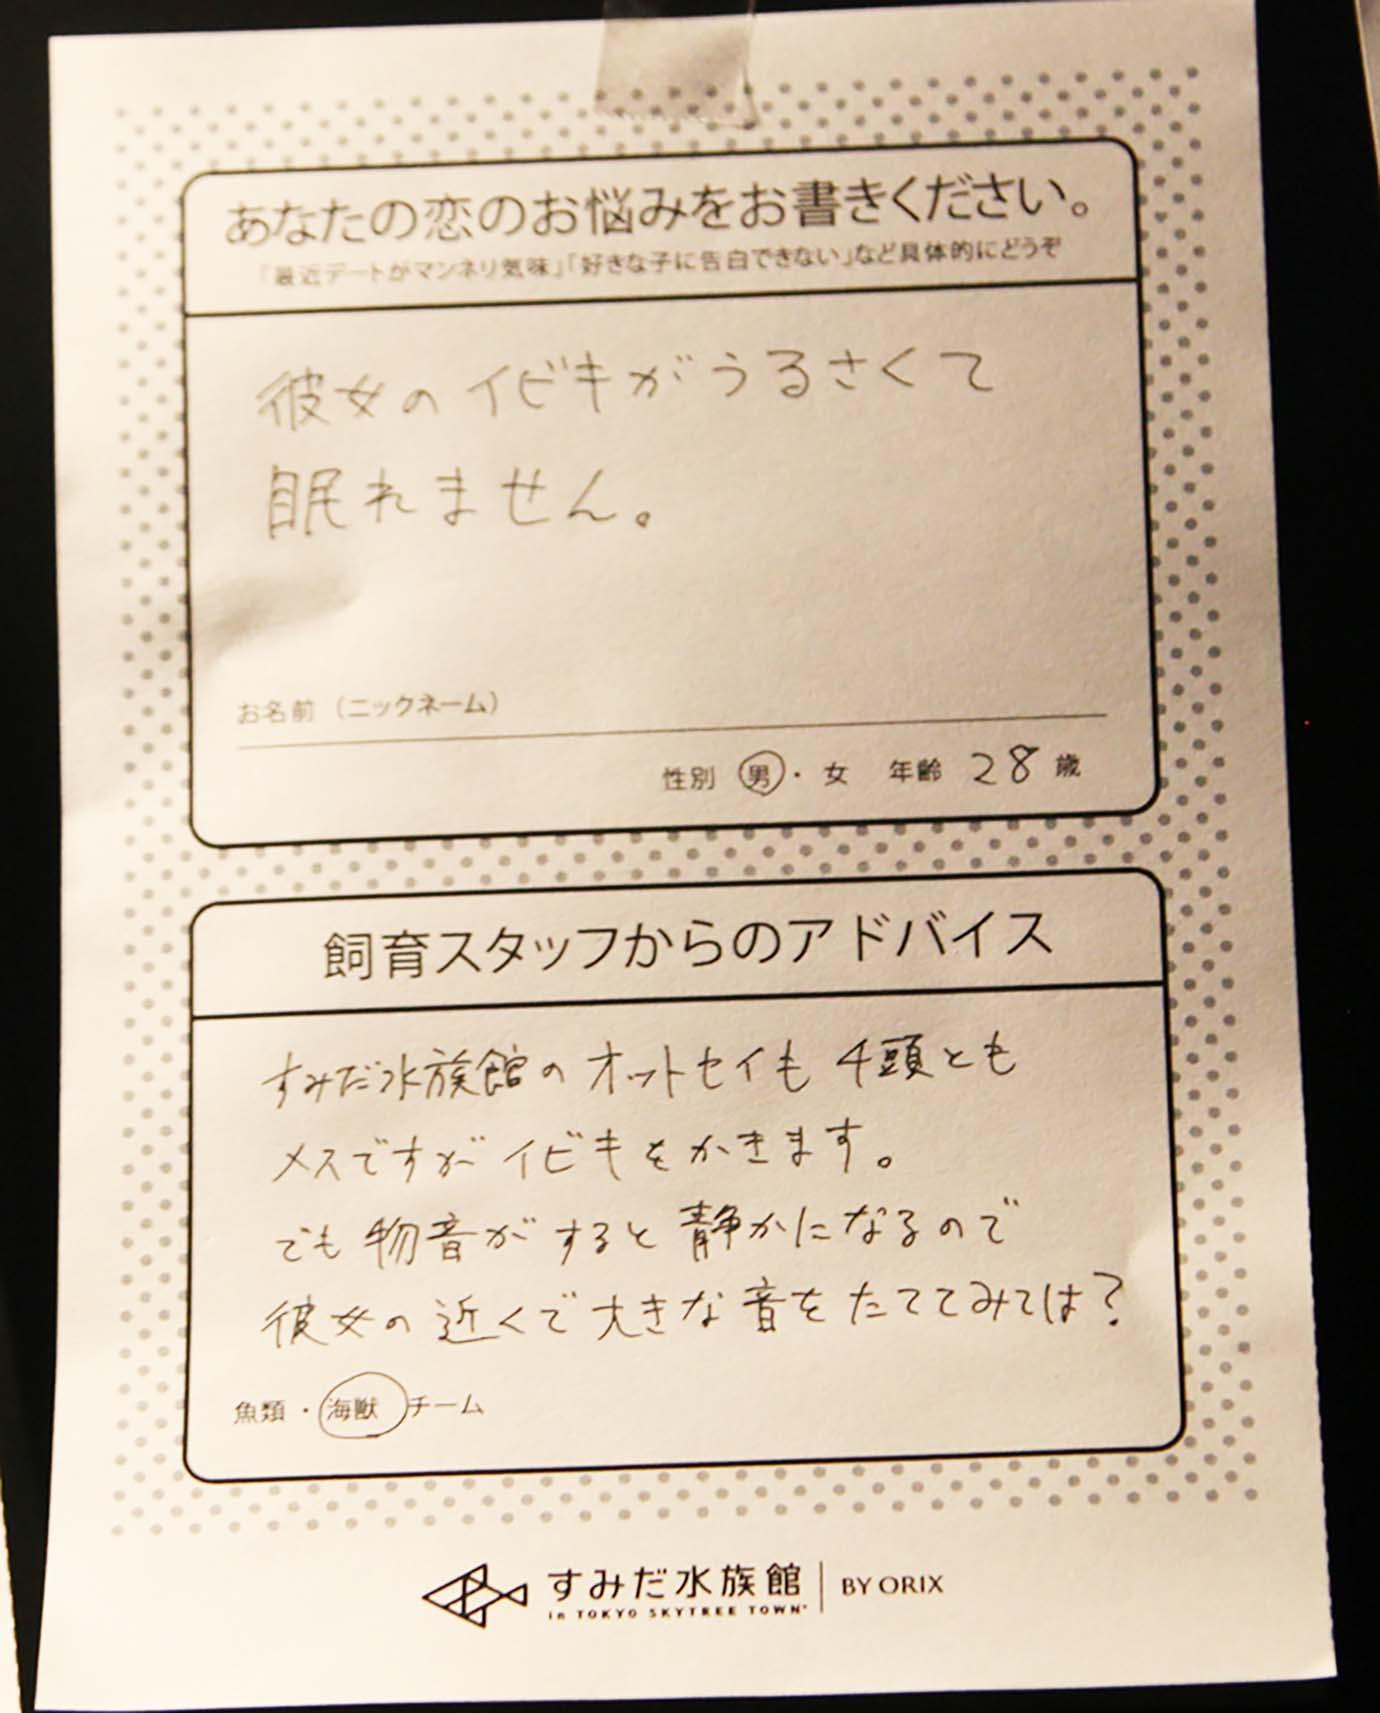 renai-game-suizokukan1